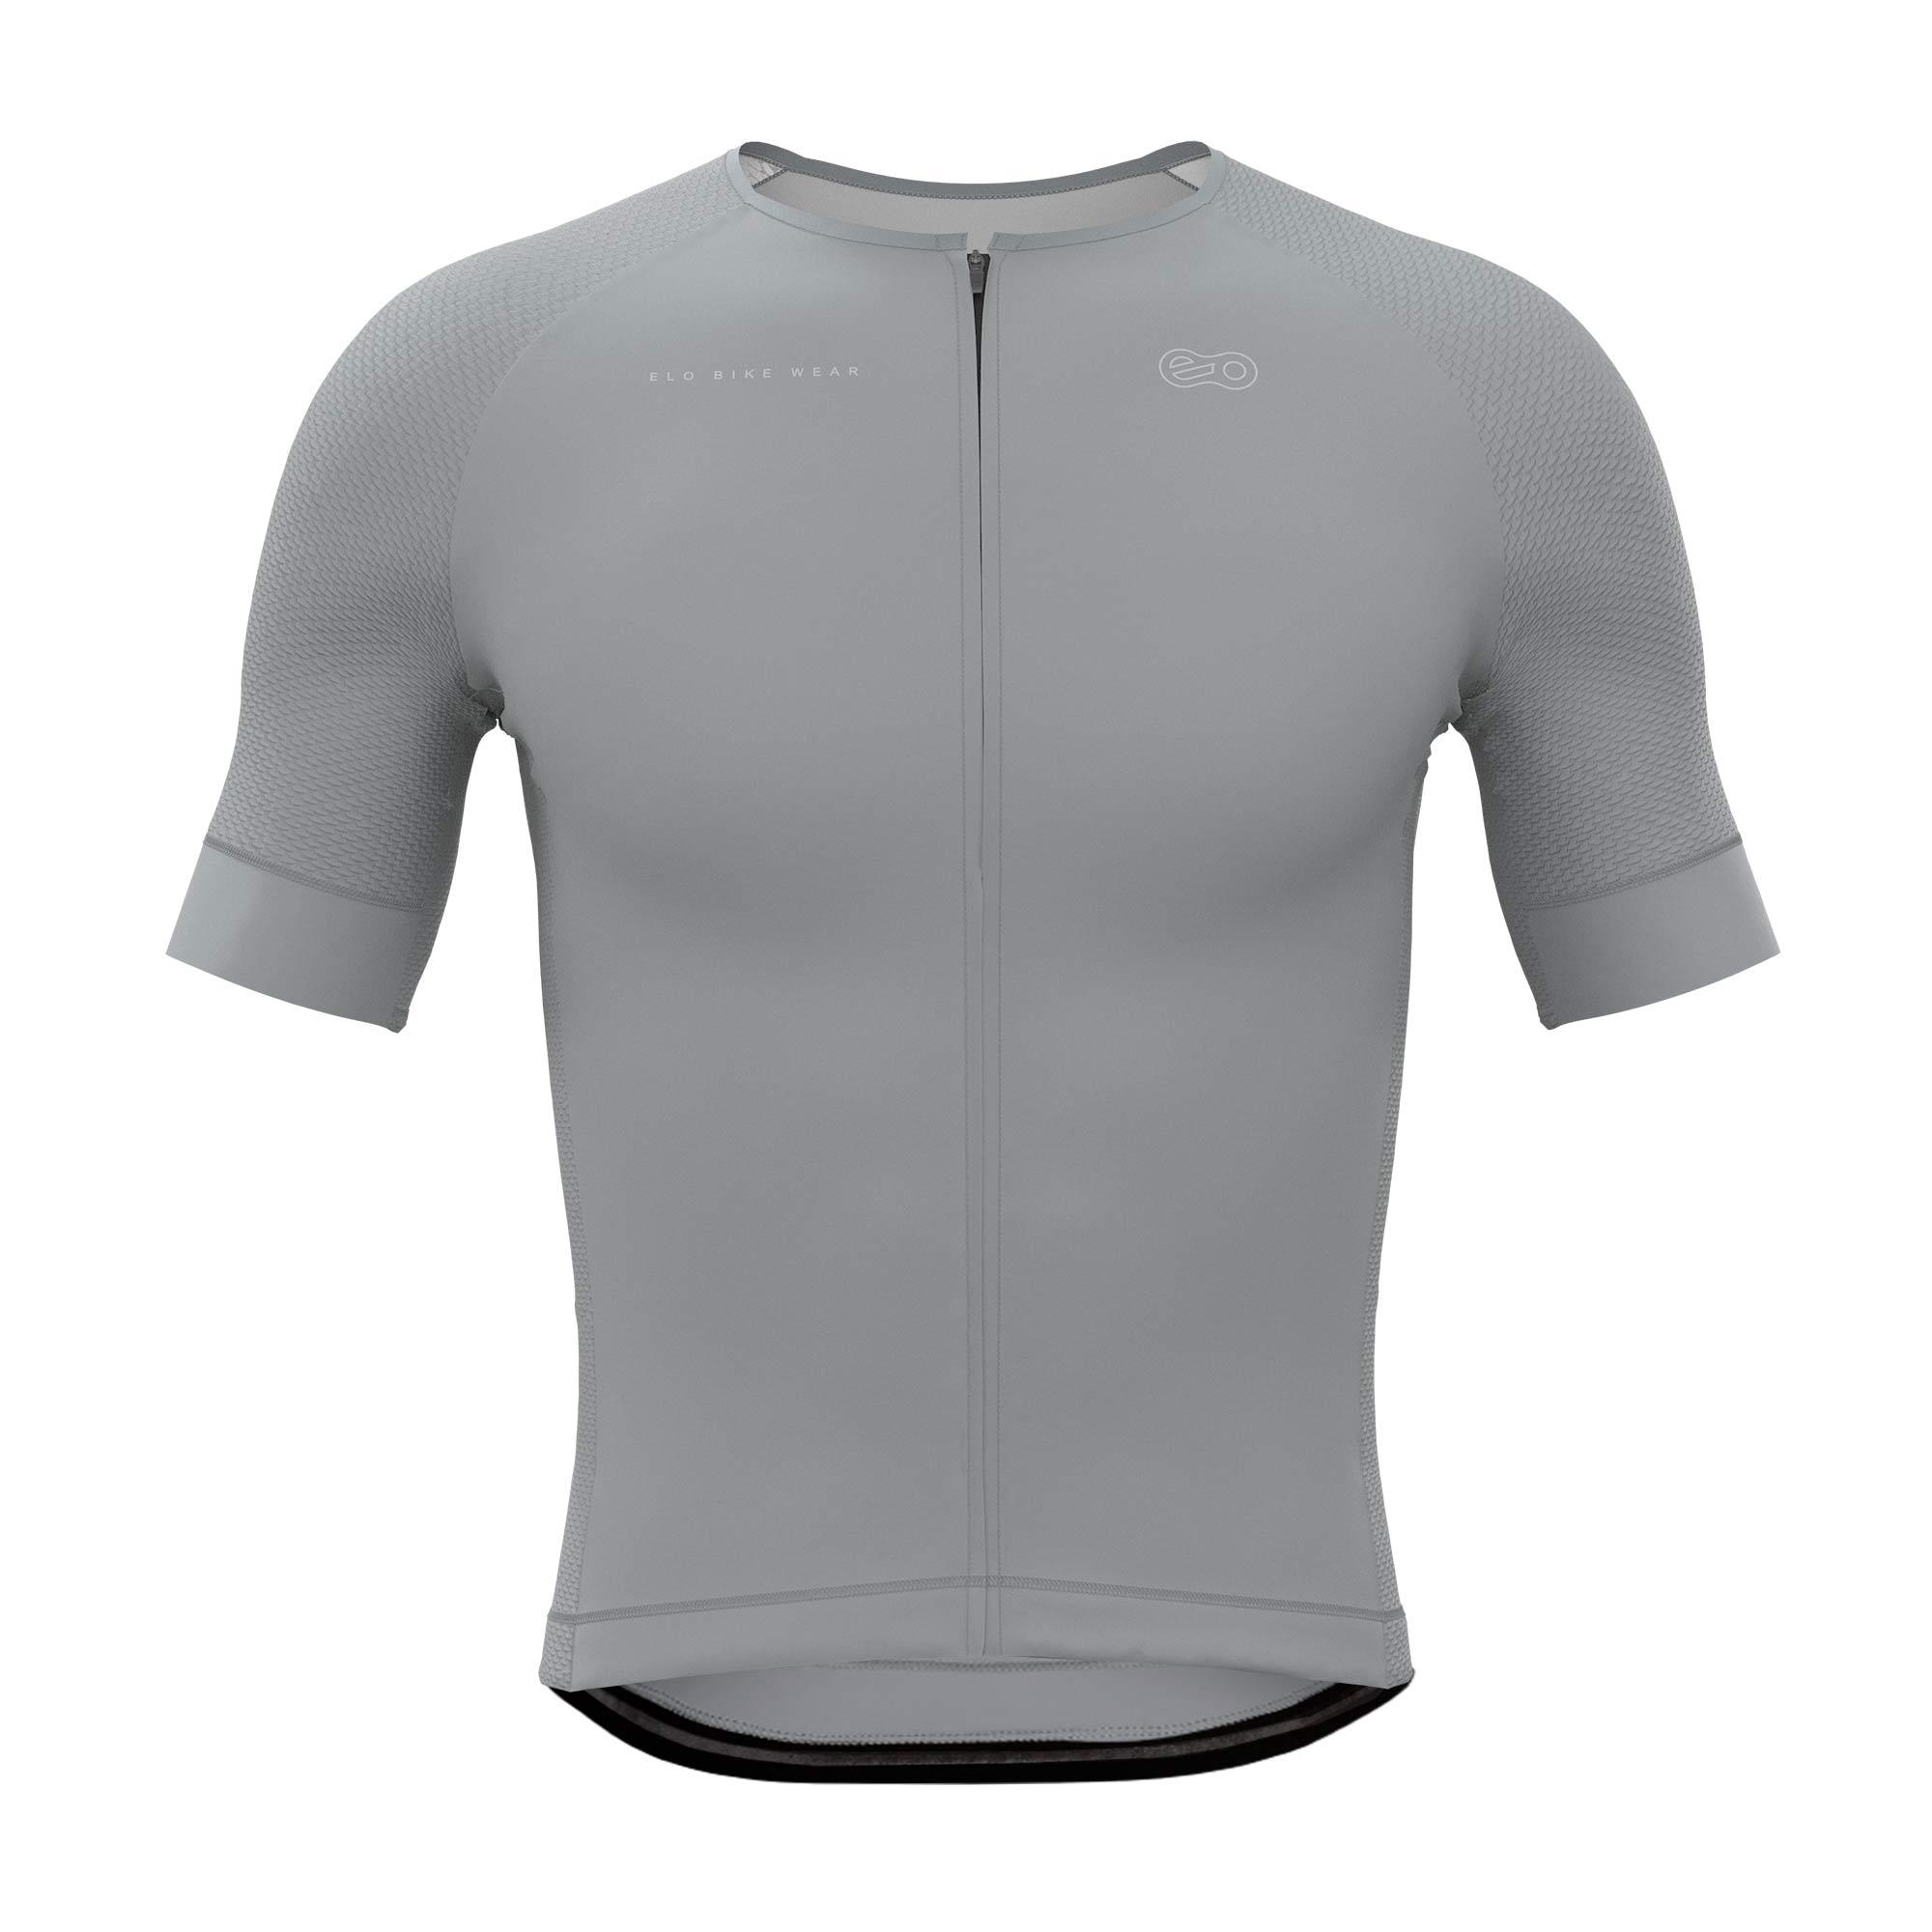 Camisa de Ciclismo Race - Classic Gray